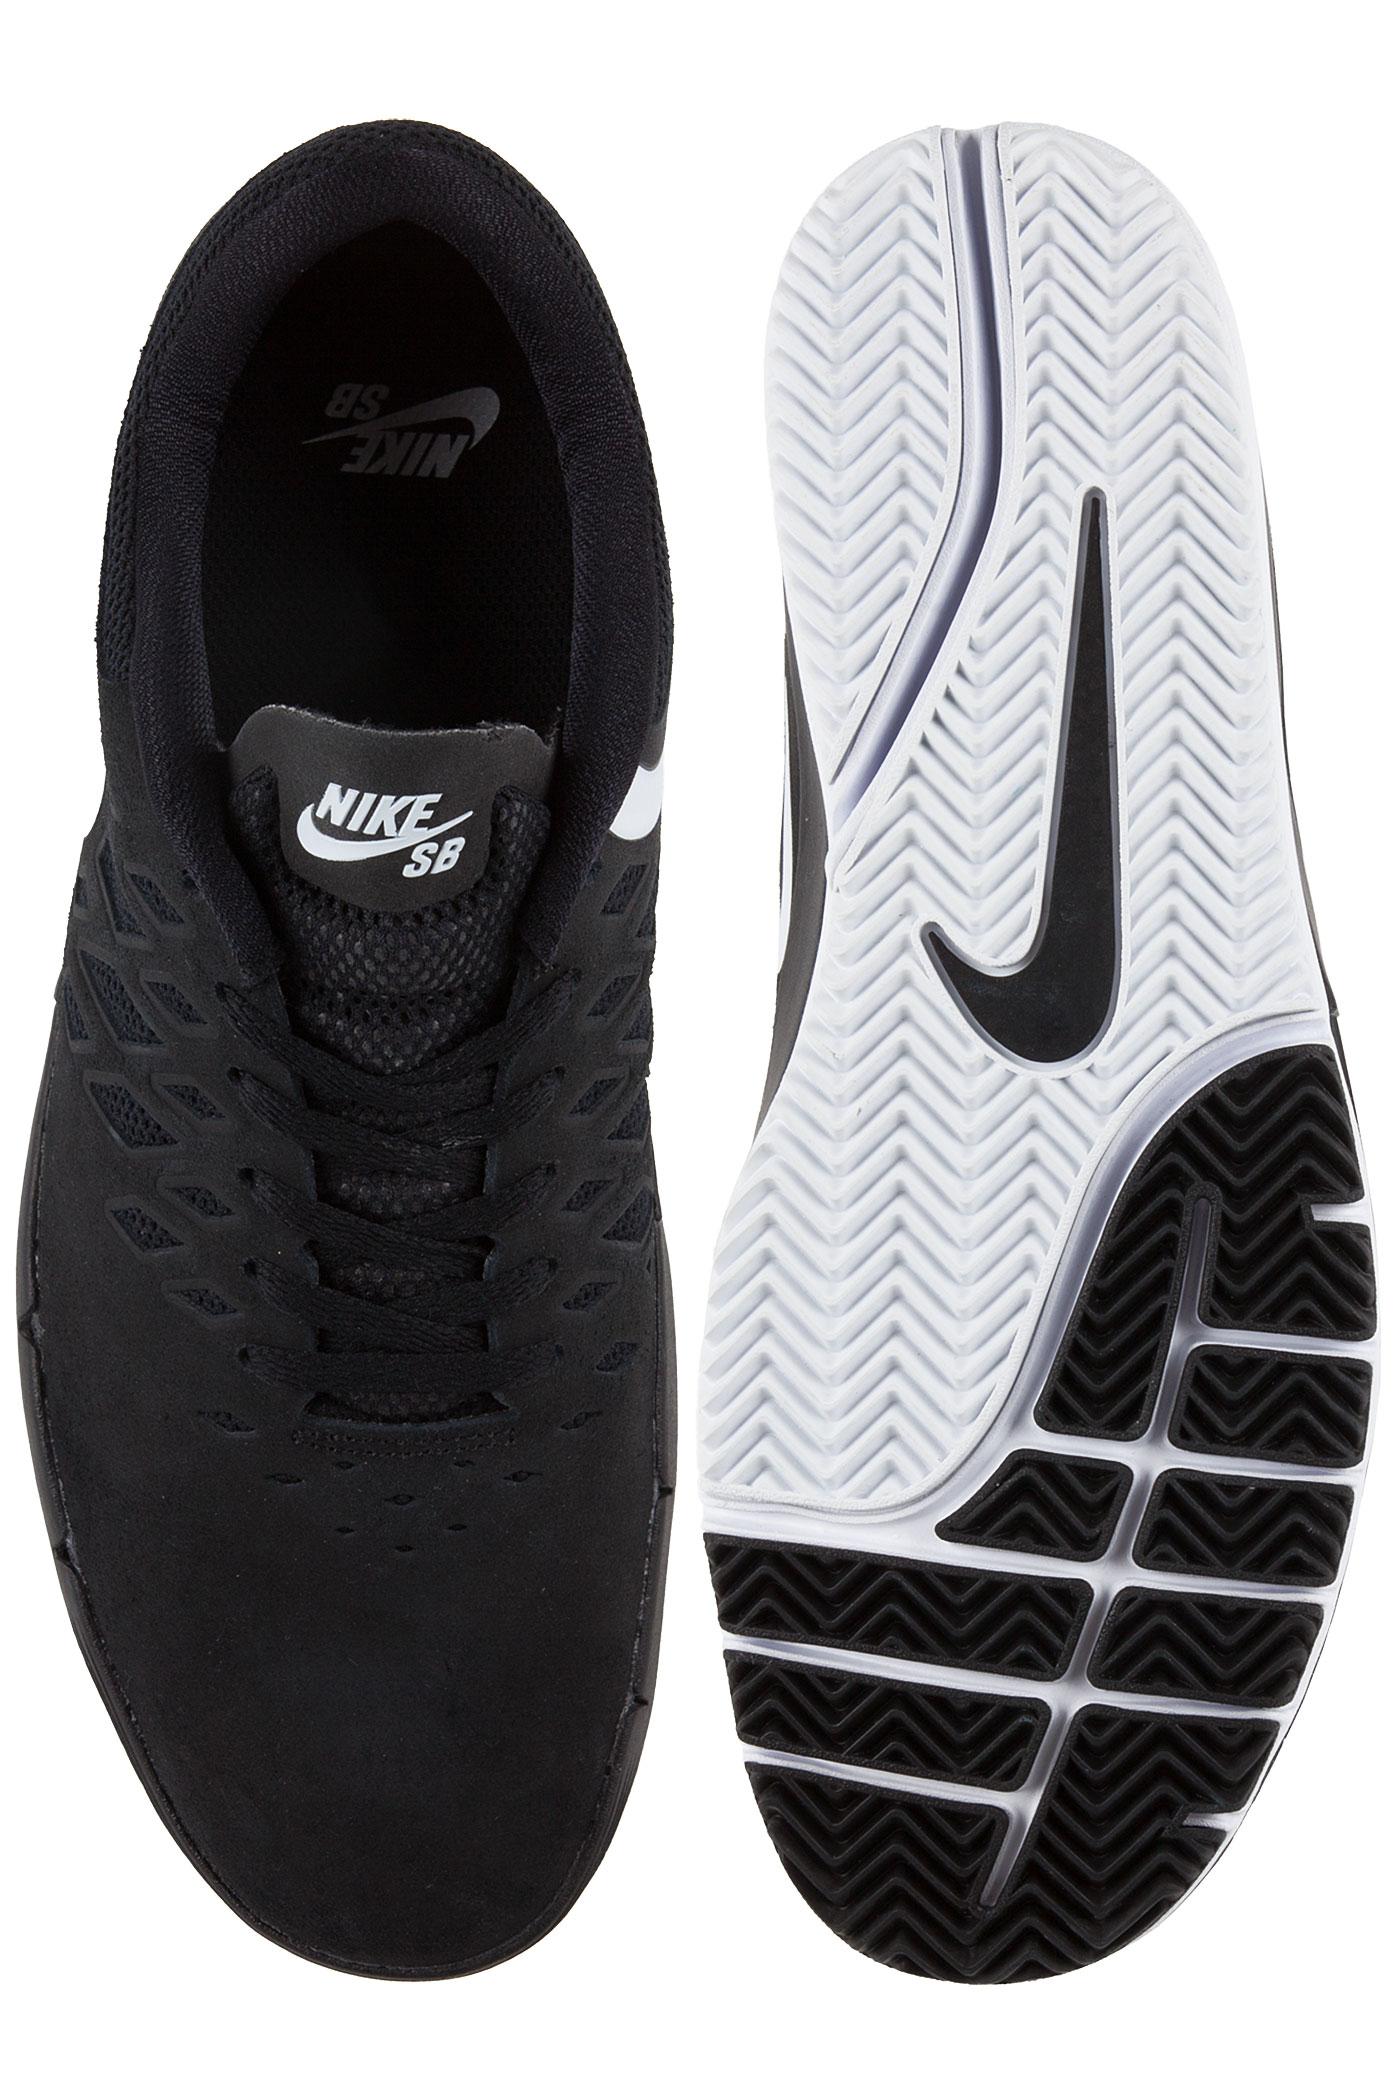 nike sb free chaussure black white achetez sur skatedeluxe. Black Bedroom Furniture Sets. Home Design Ideas